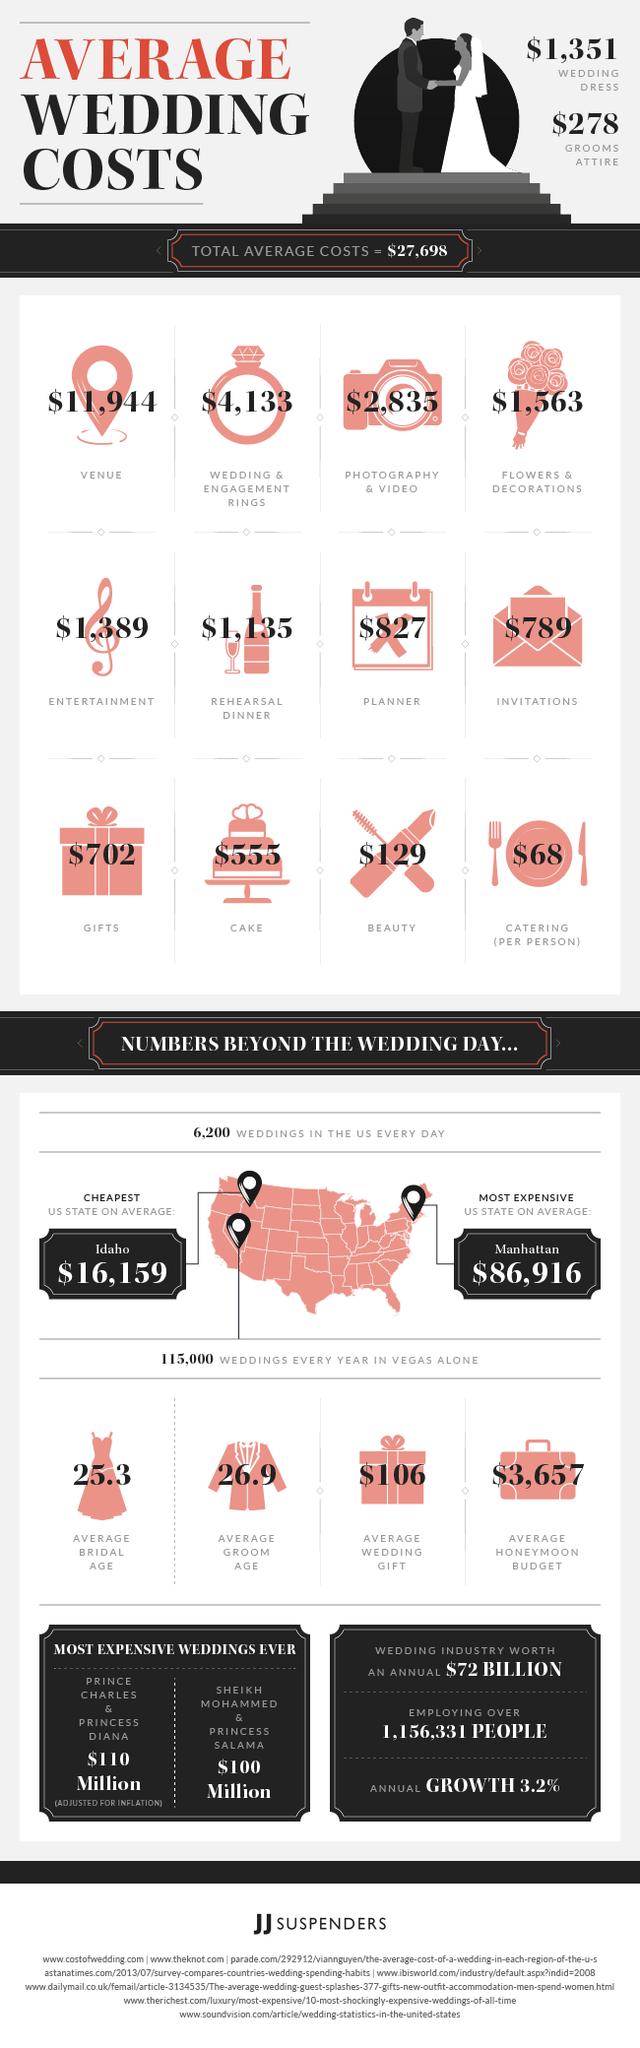 average-wedding-cost